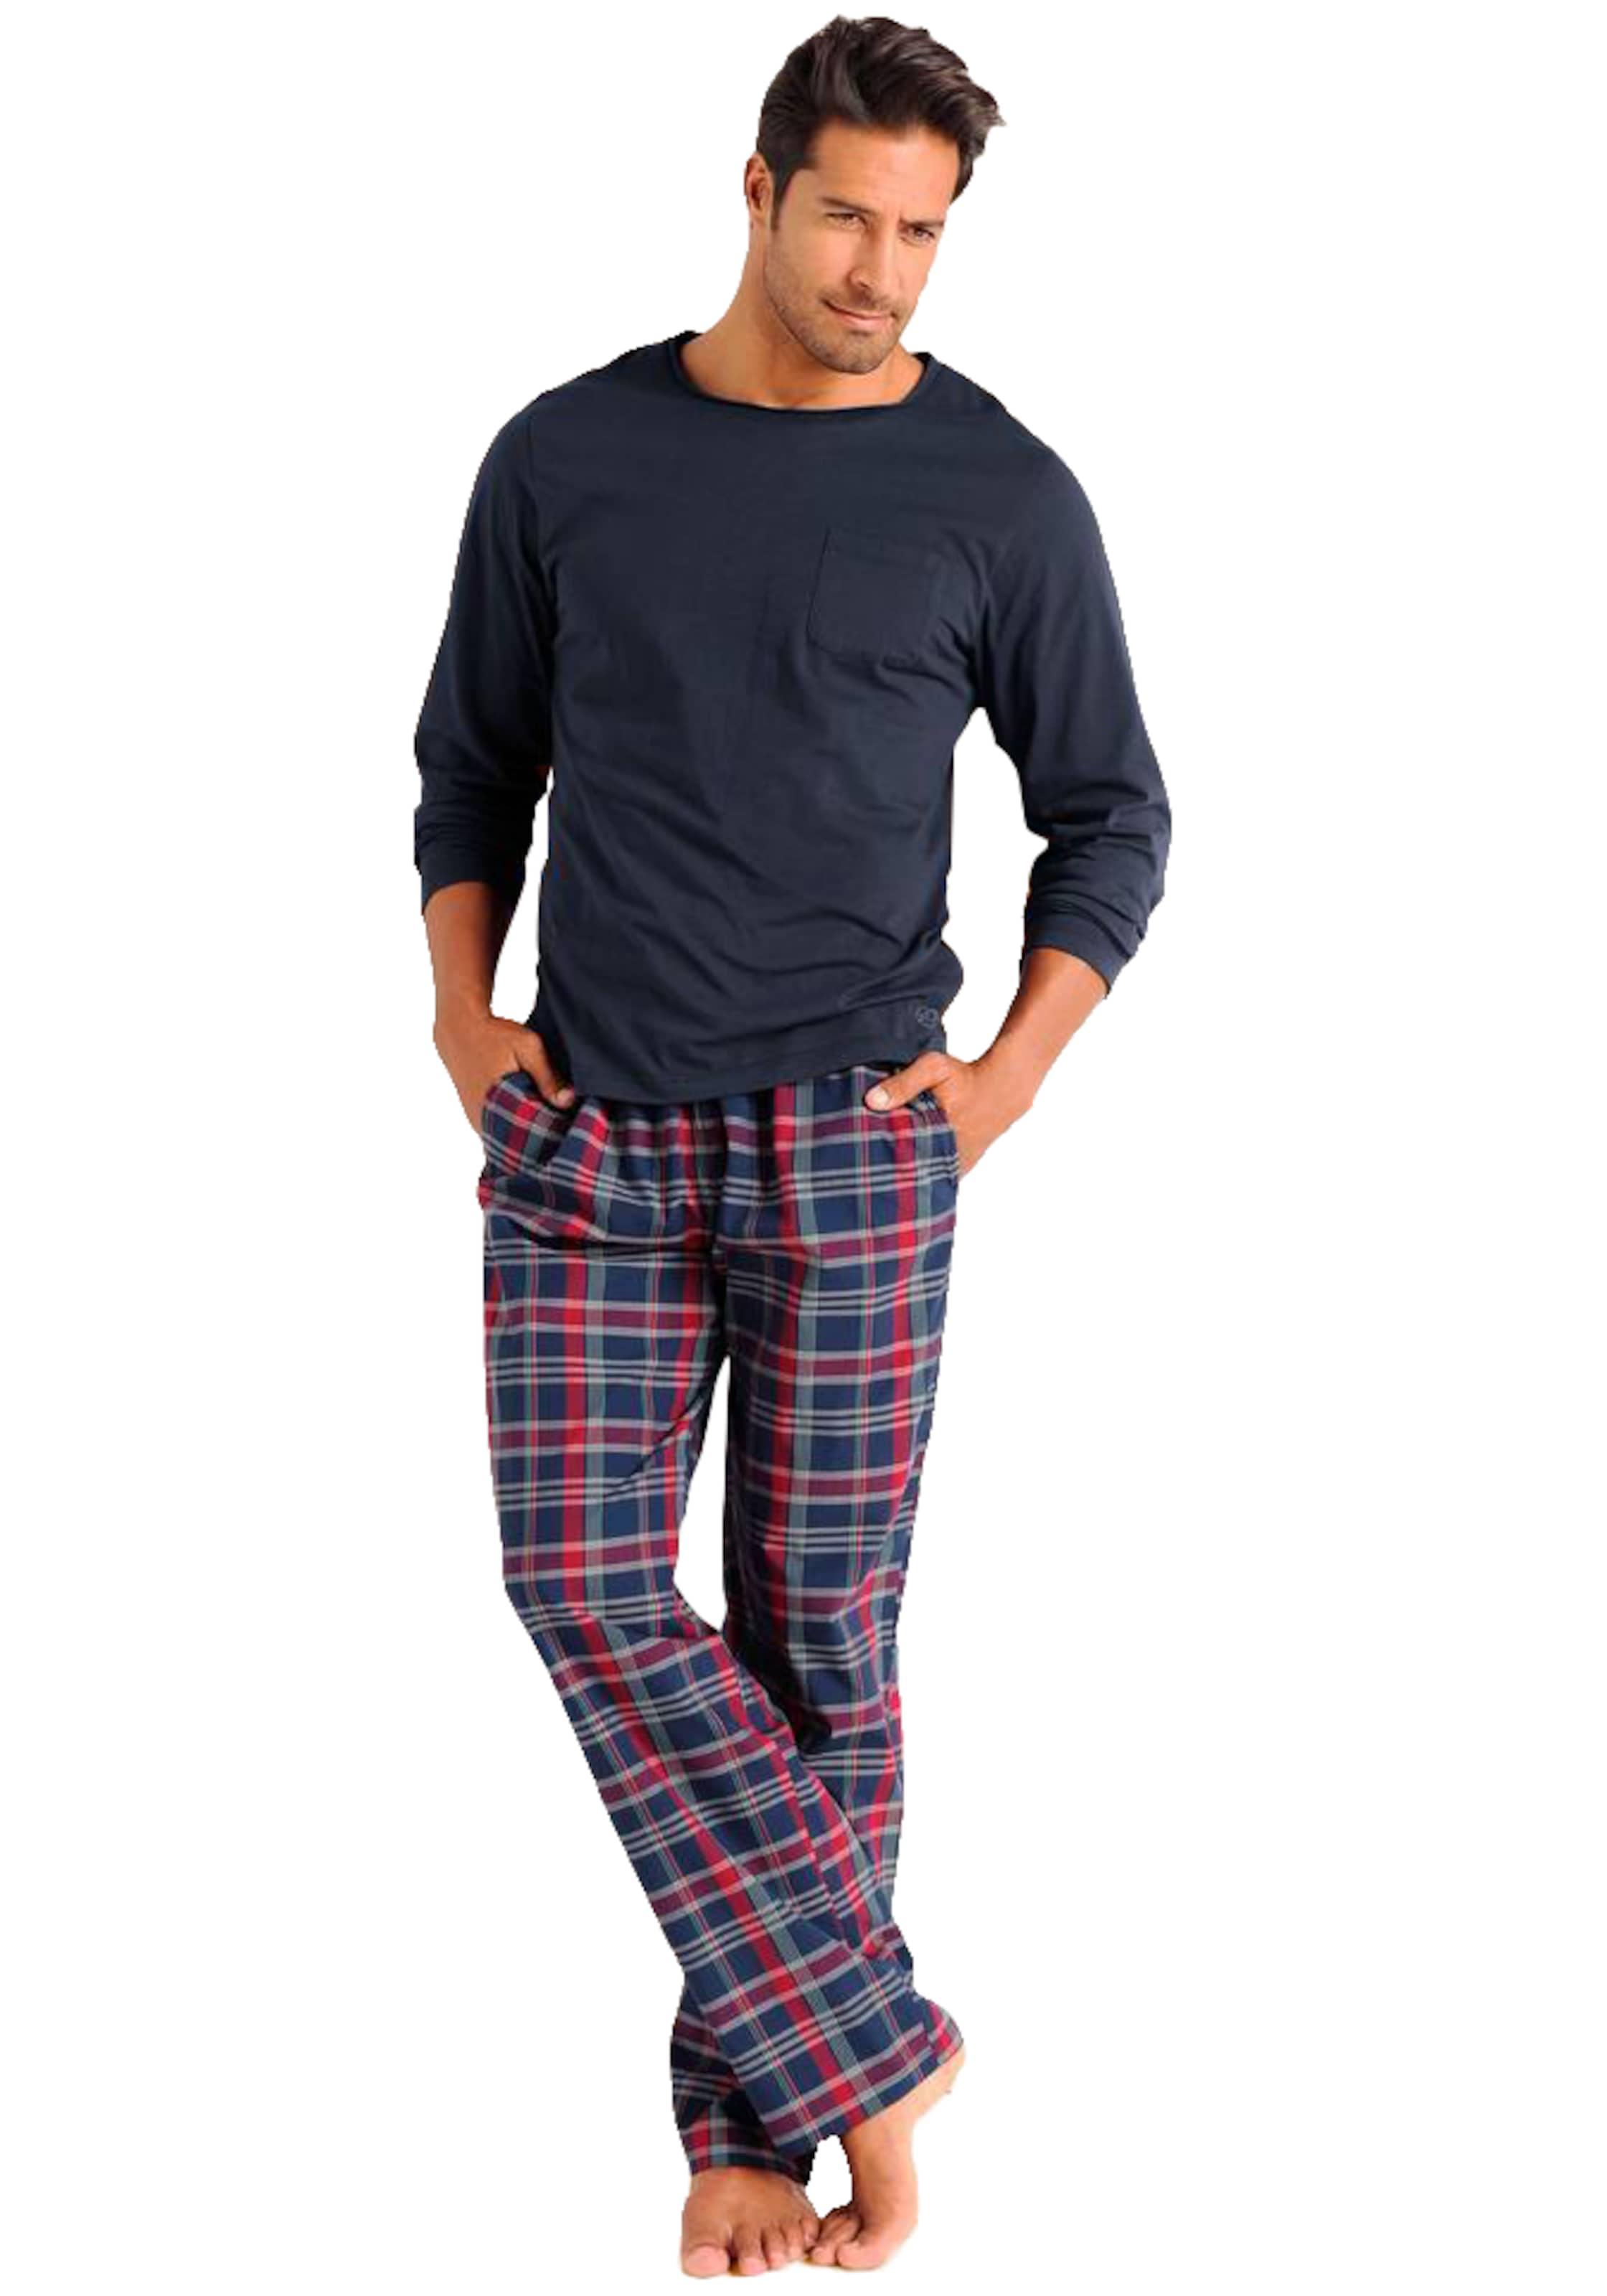 Lang oliver Pyjama Navy S In WEYDH9I2